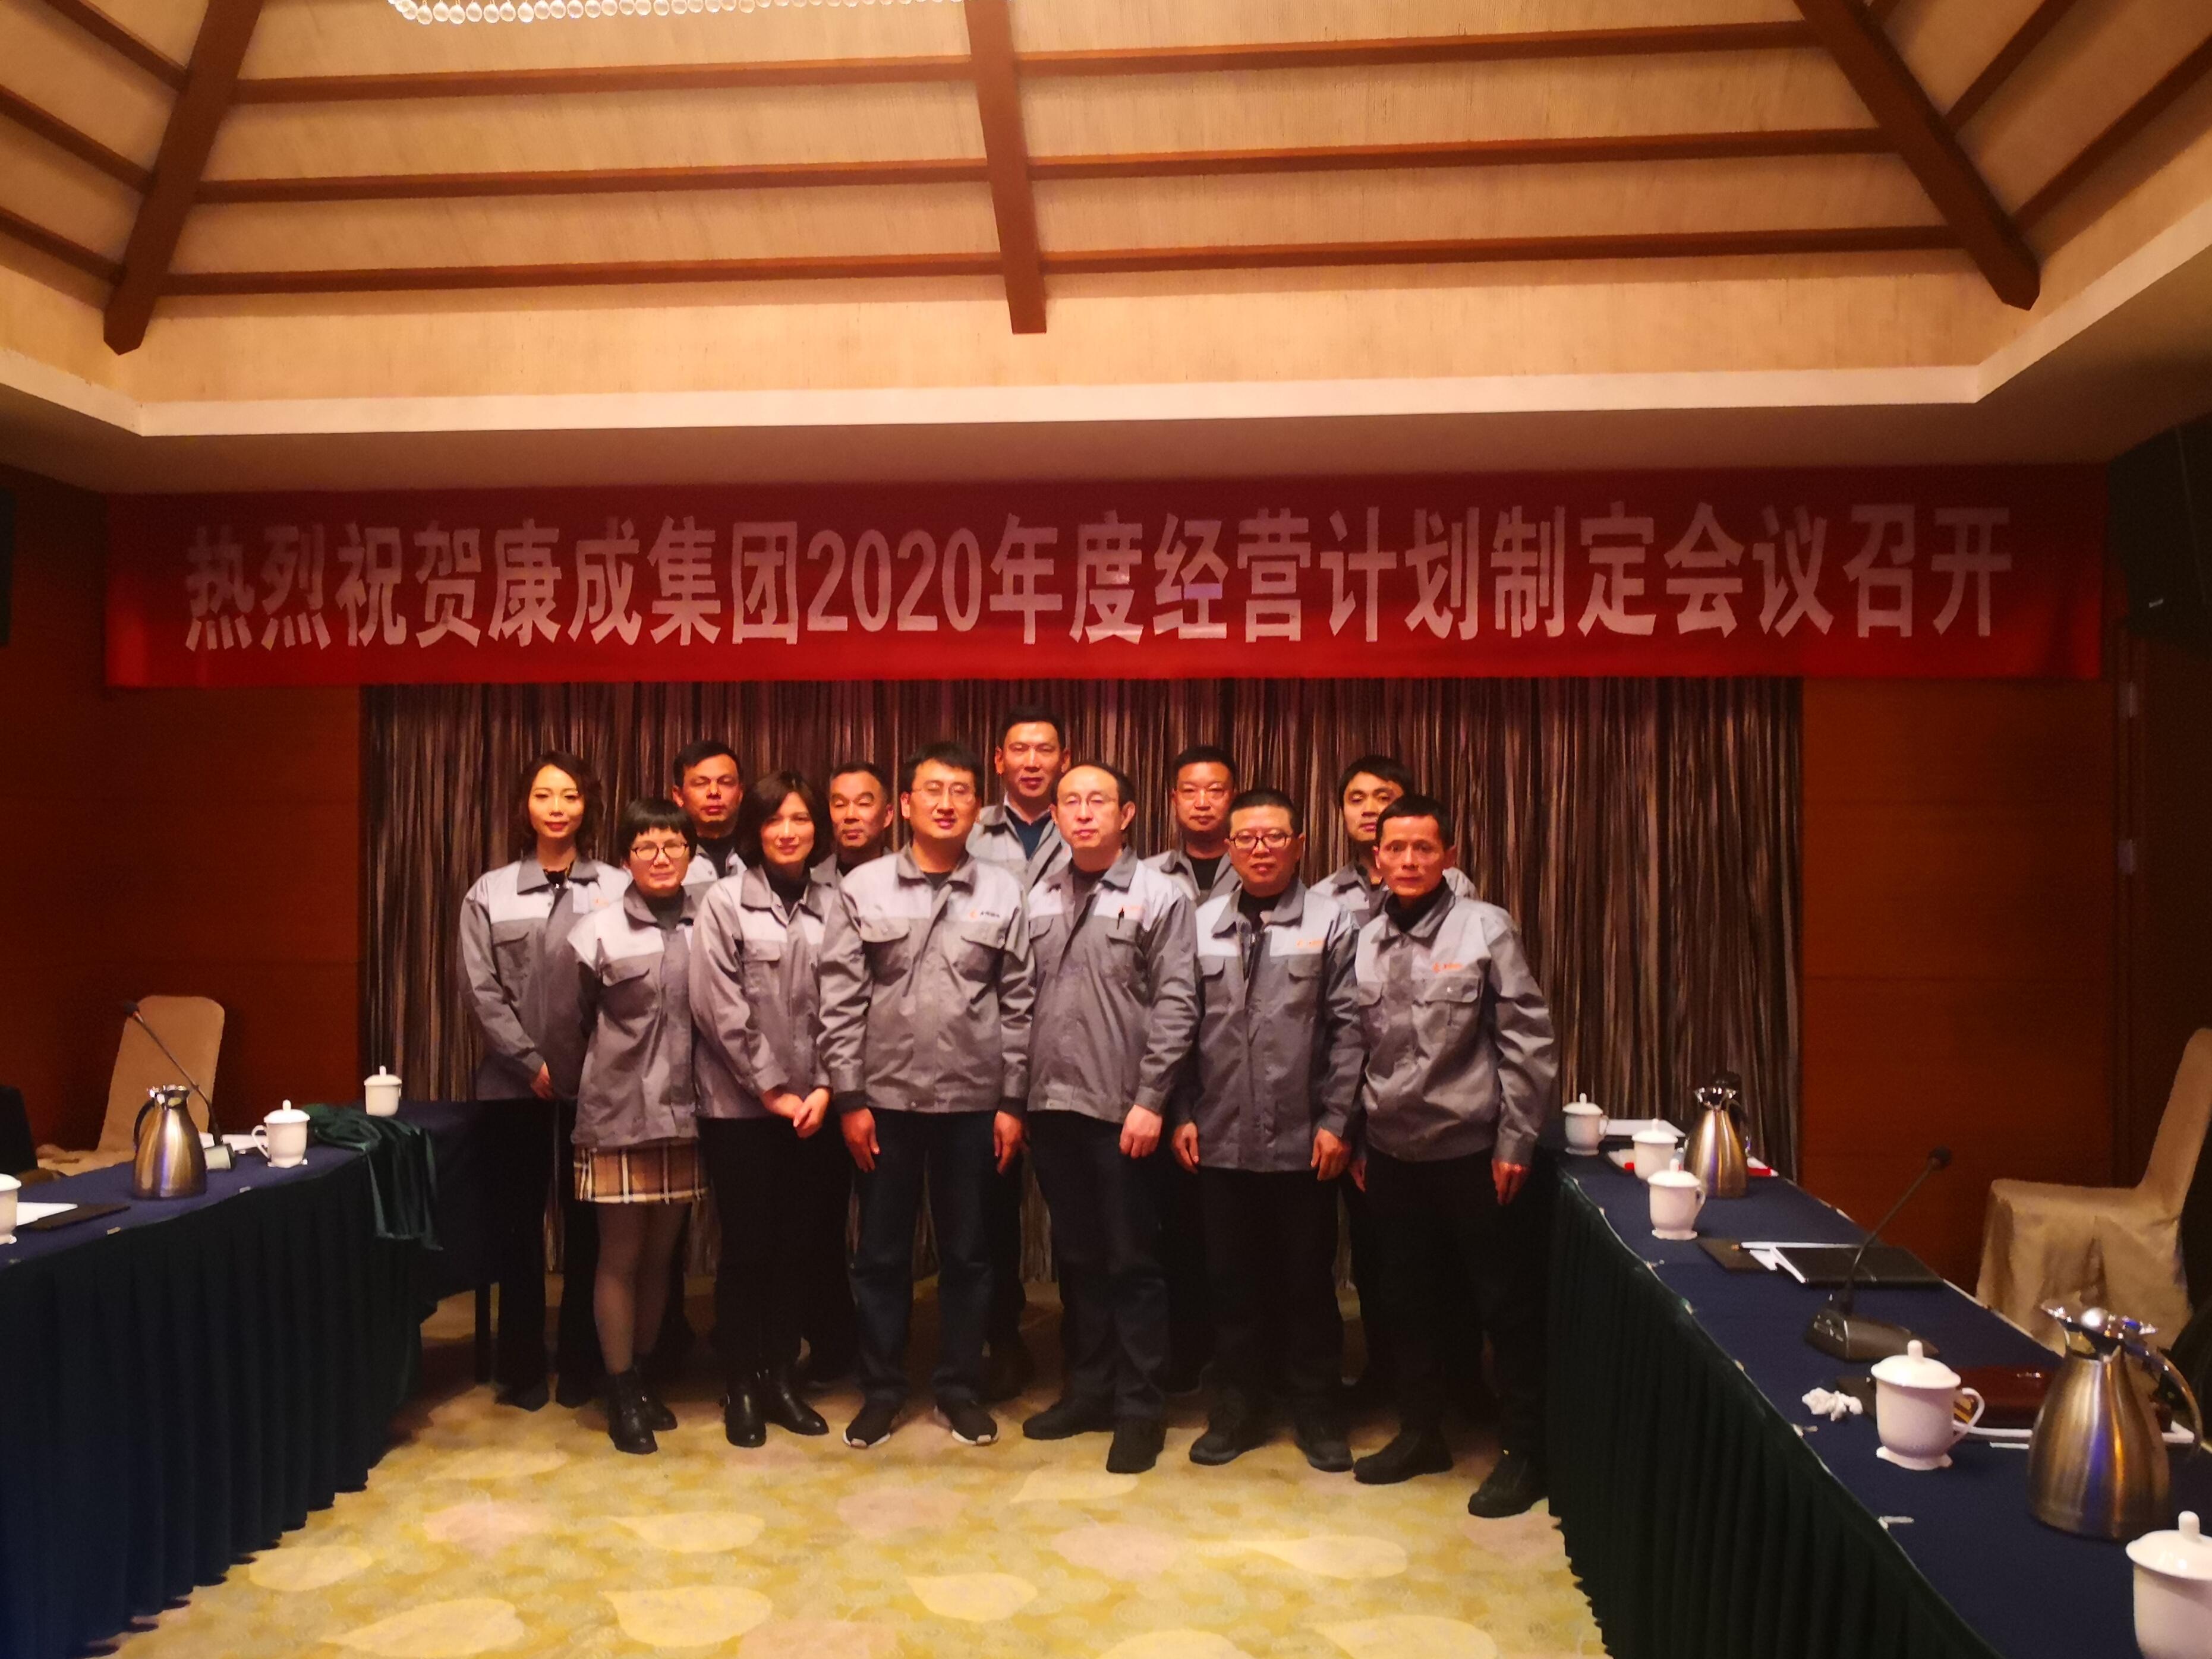 Kangcheng group 2020 annual business plan formulation meeting